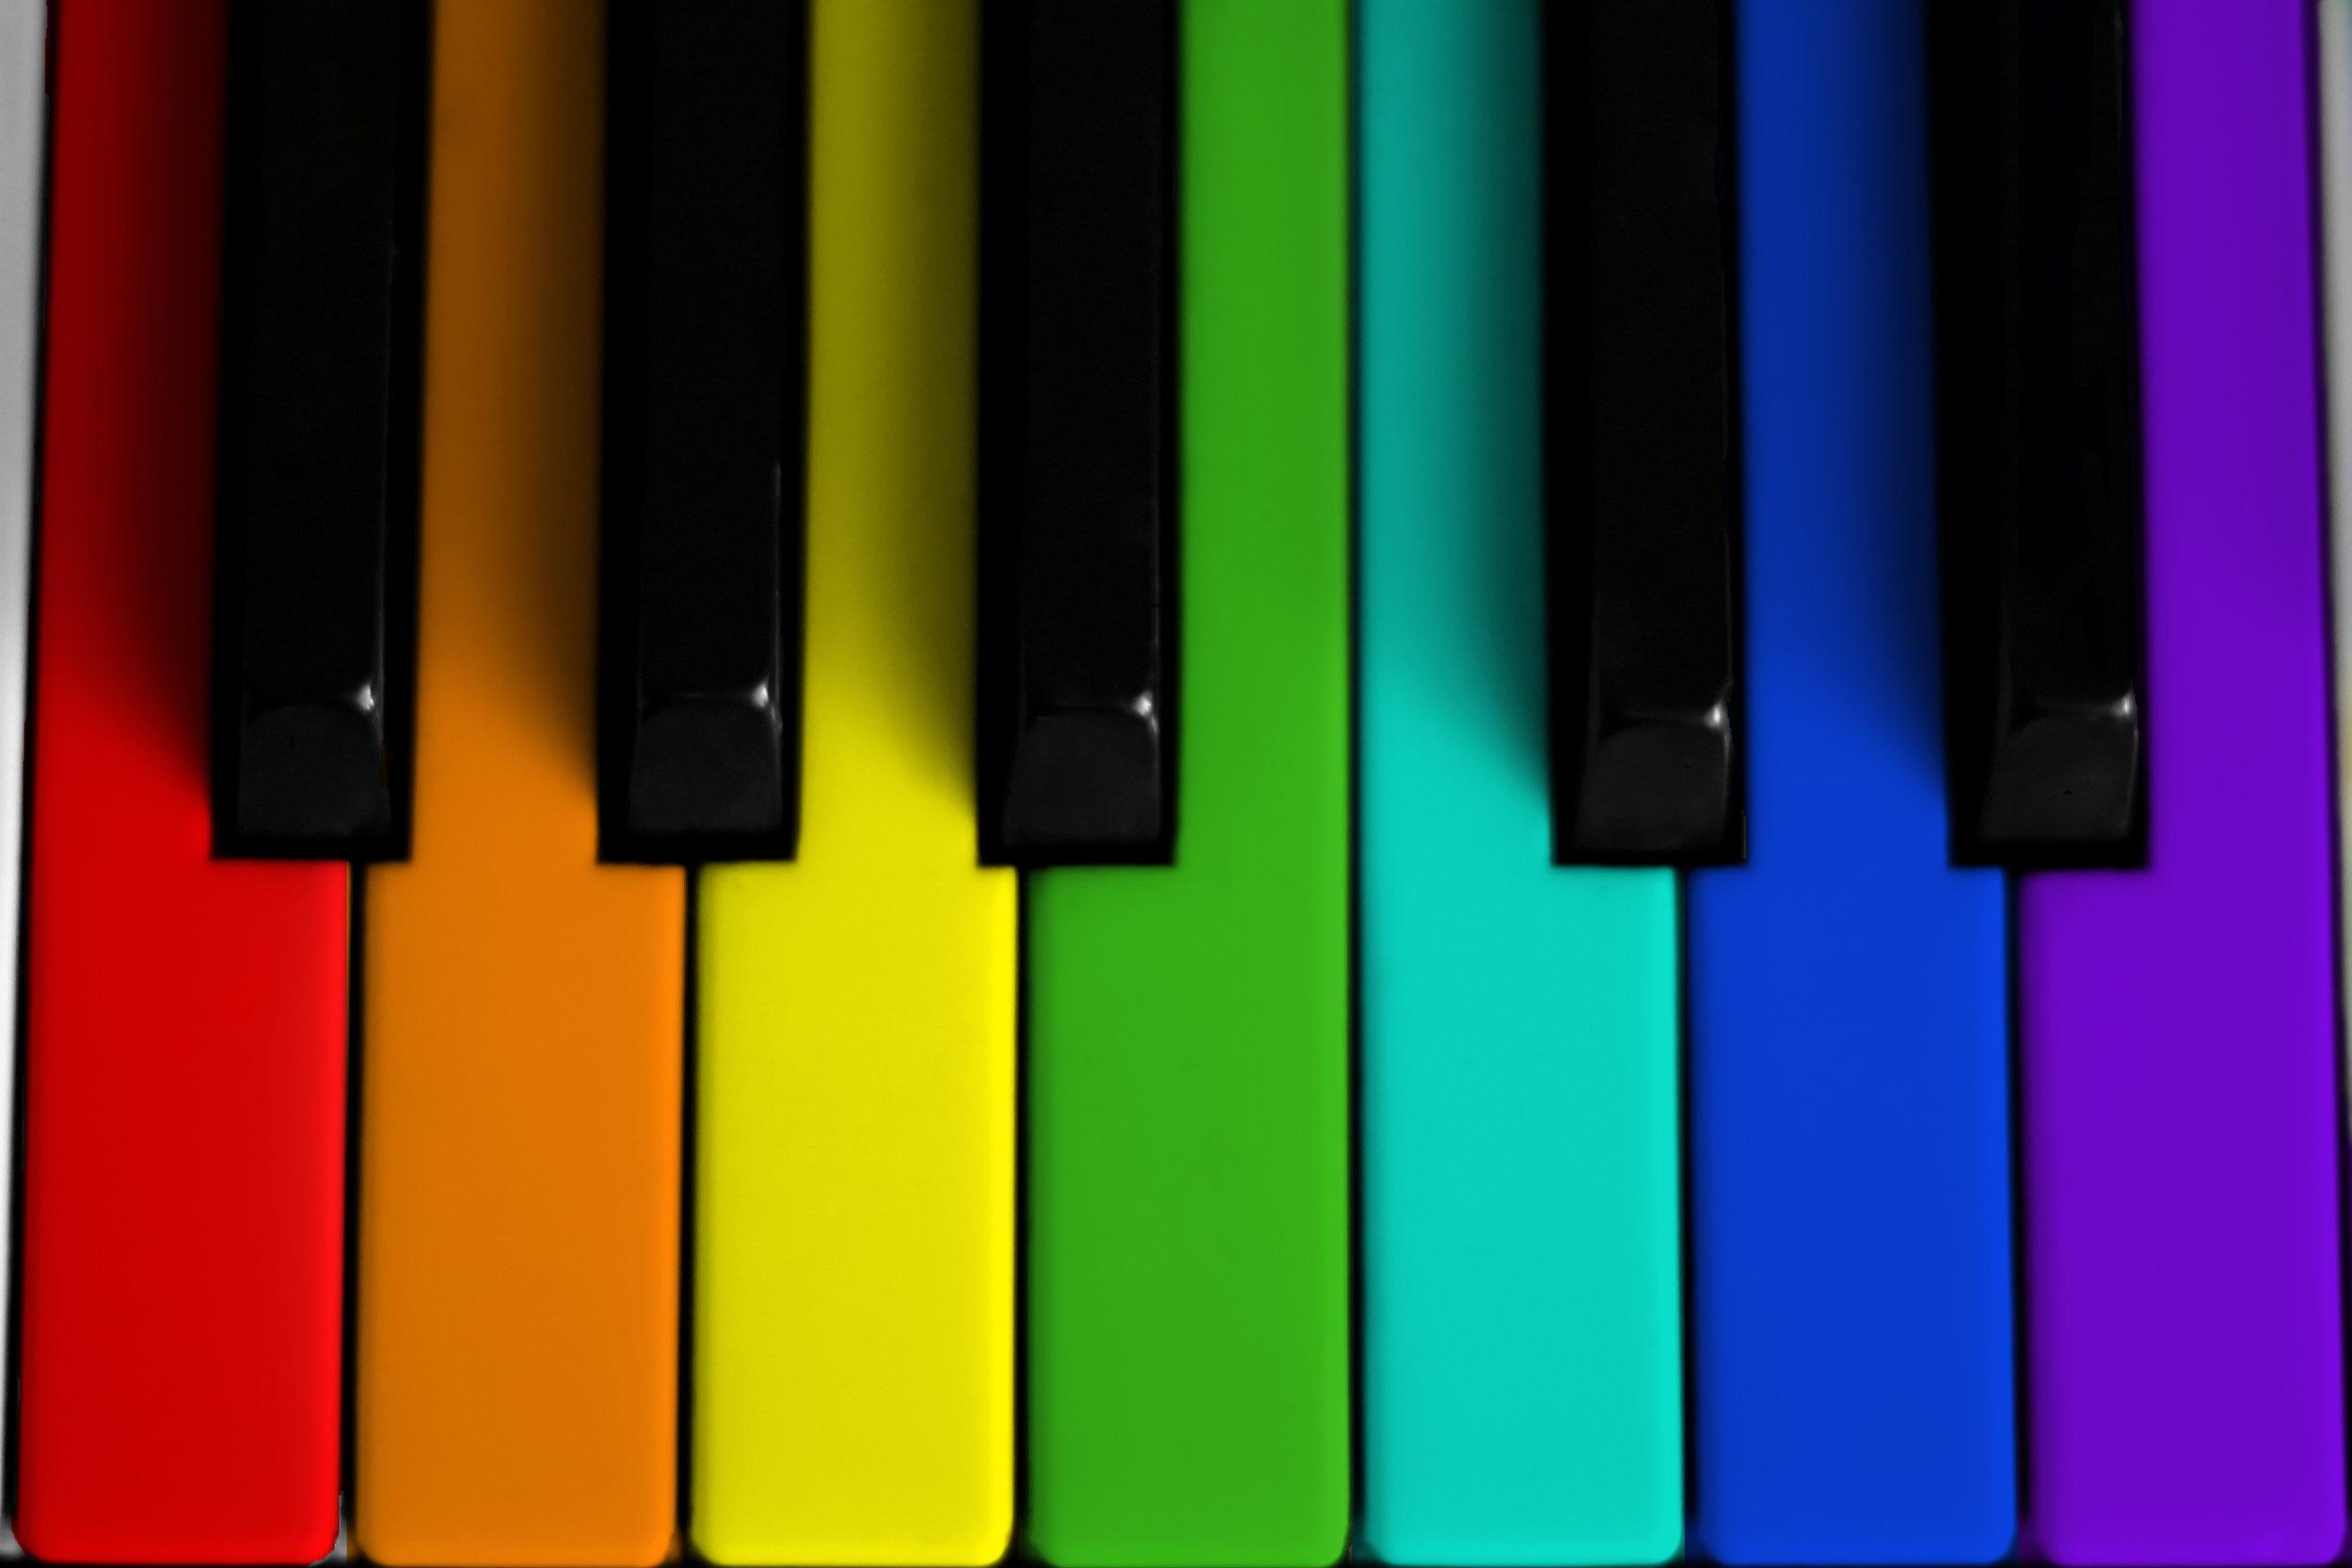 My Angel (A.N.C) - © 2015Genre: Acoustic Guitar/PianoTheme: Love